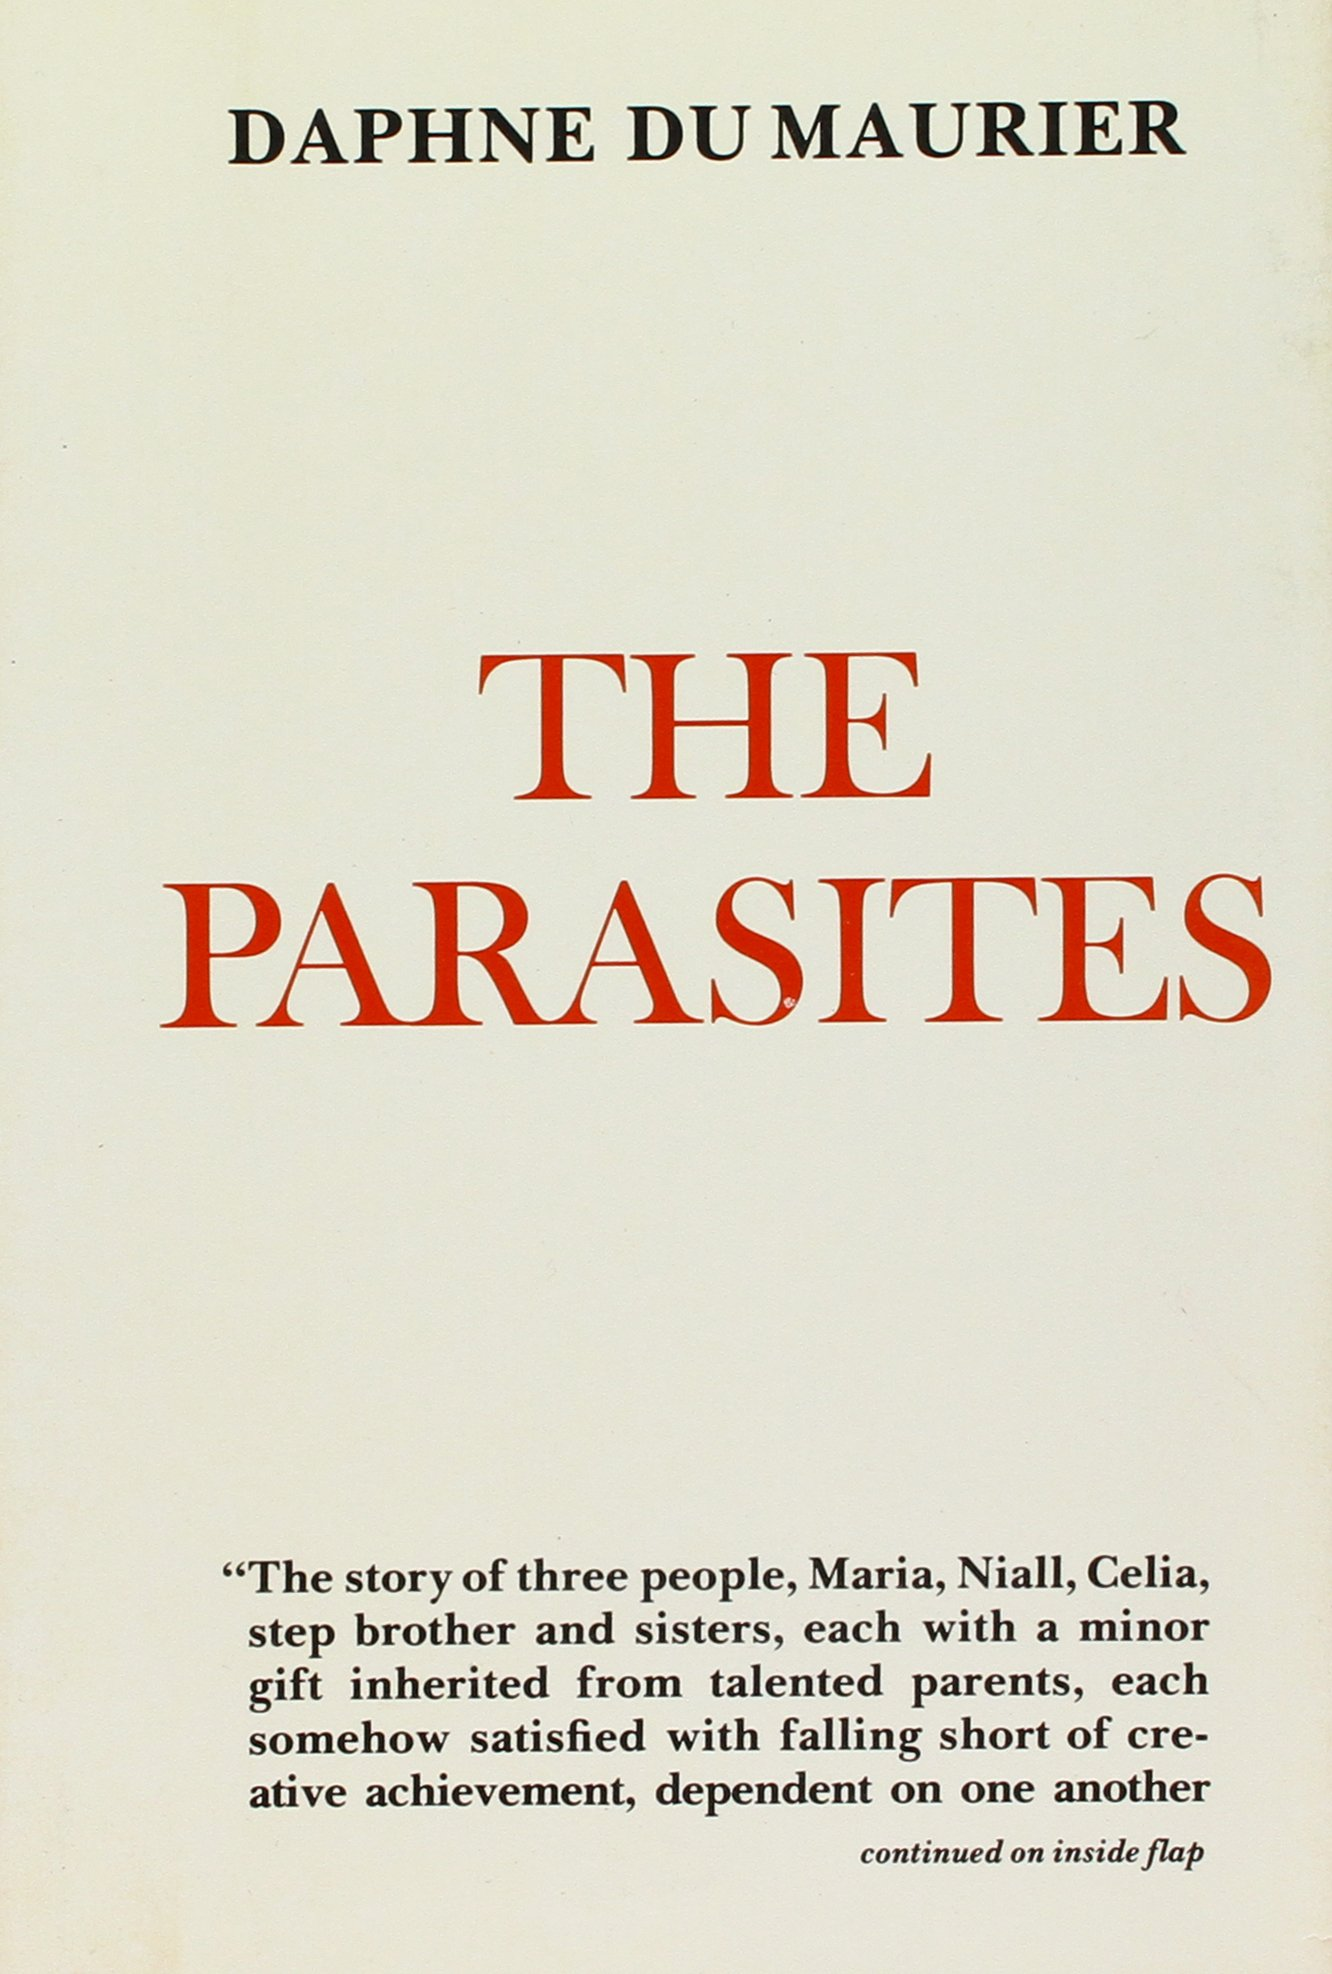 daphne du maurier paraziták áttekintése